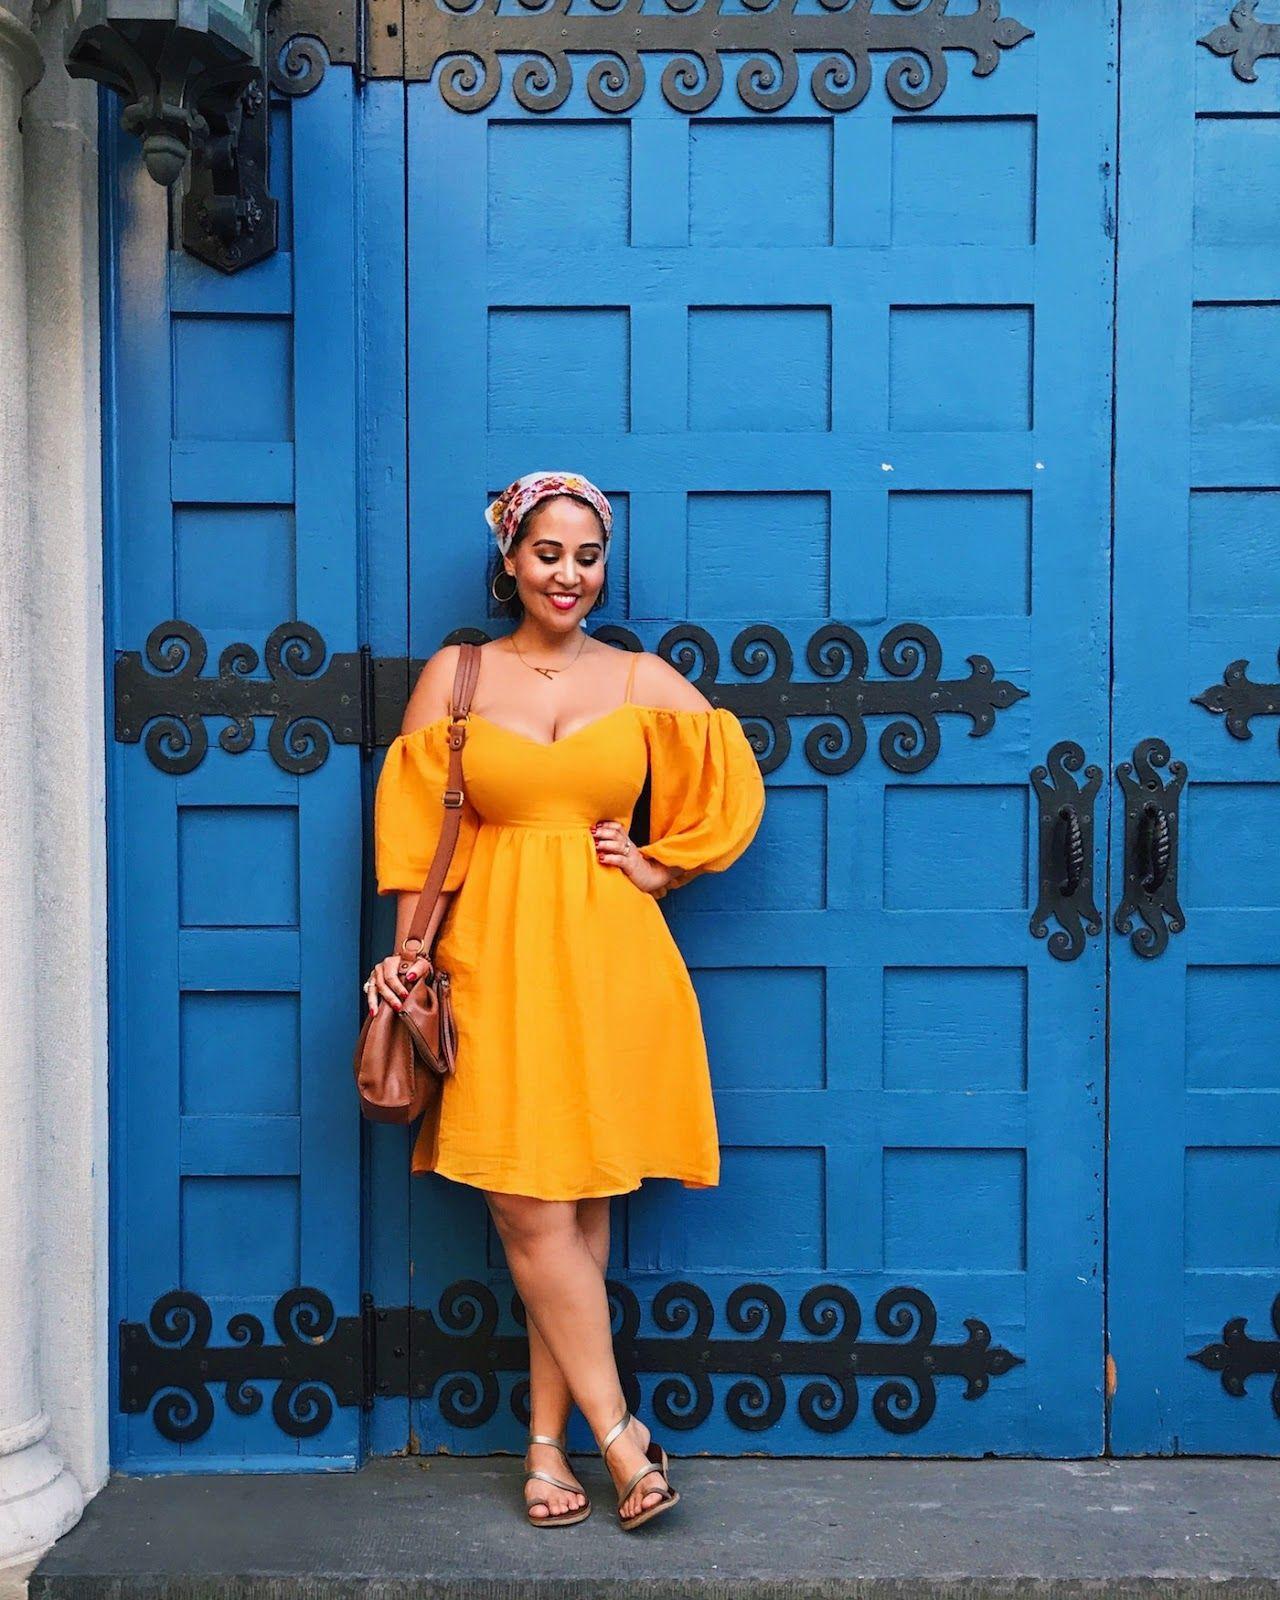 Curvy Style A Flattering Flowy Dress For Hot Summer Days Curvy Dress Curvy Girl Outfits Curvy Fashion [ 1600 x 1280 Pixel ]